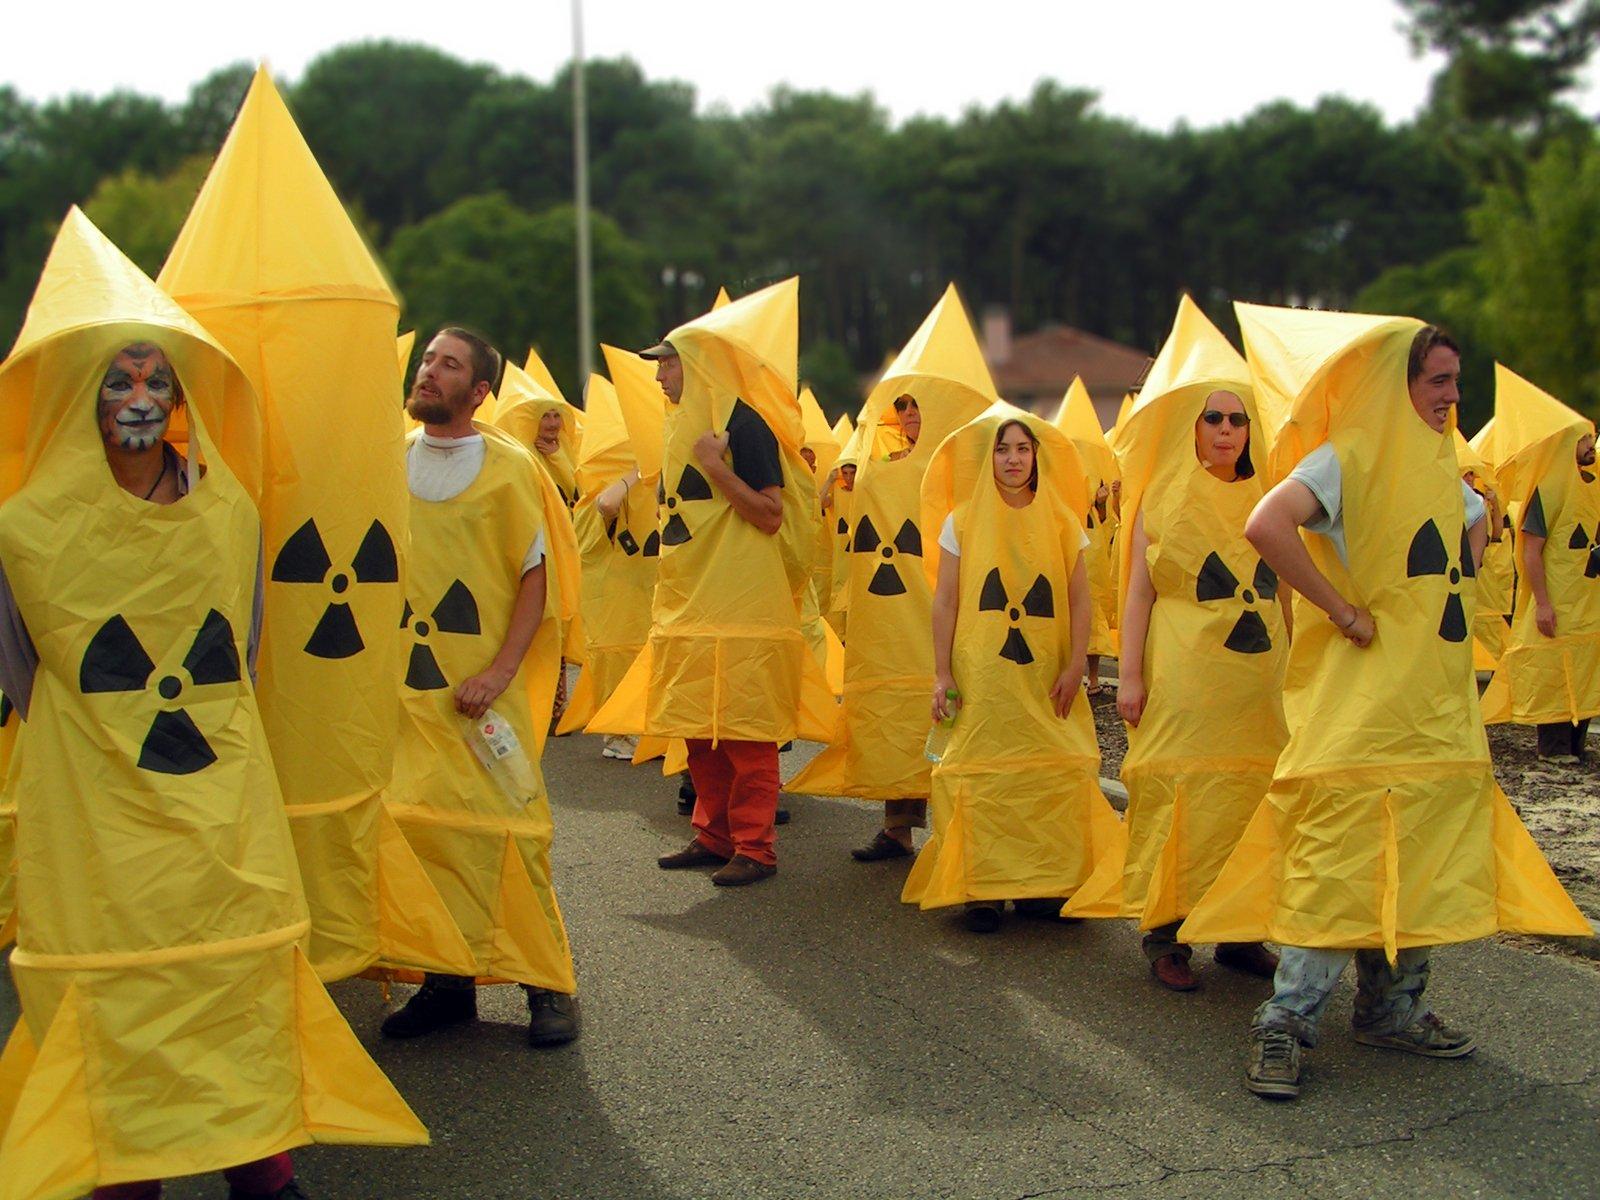 Manifestation against missile